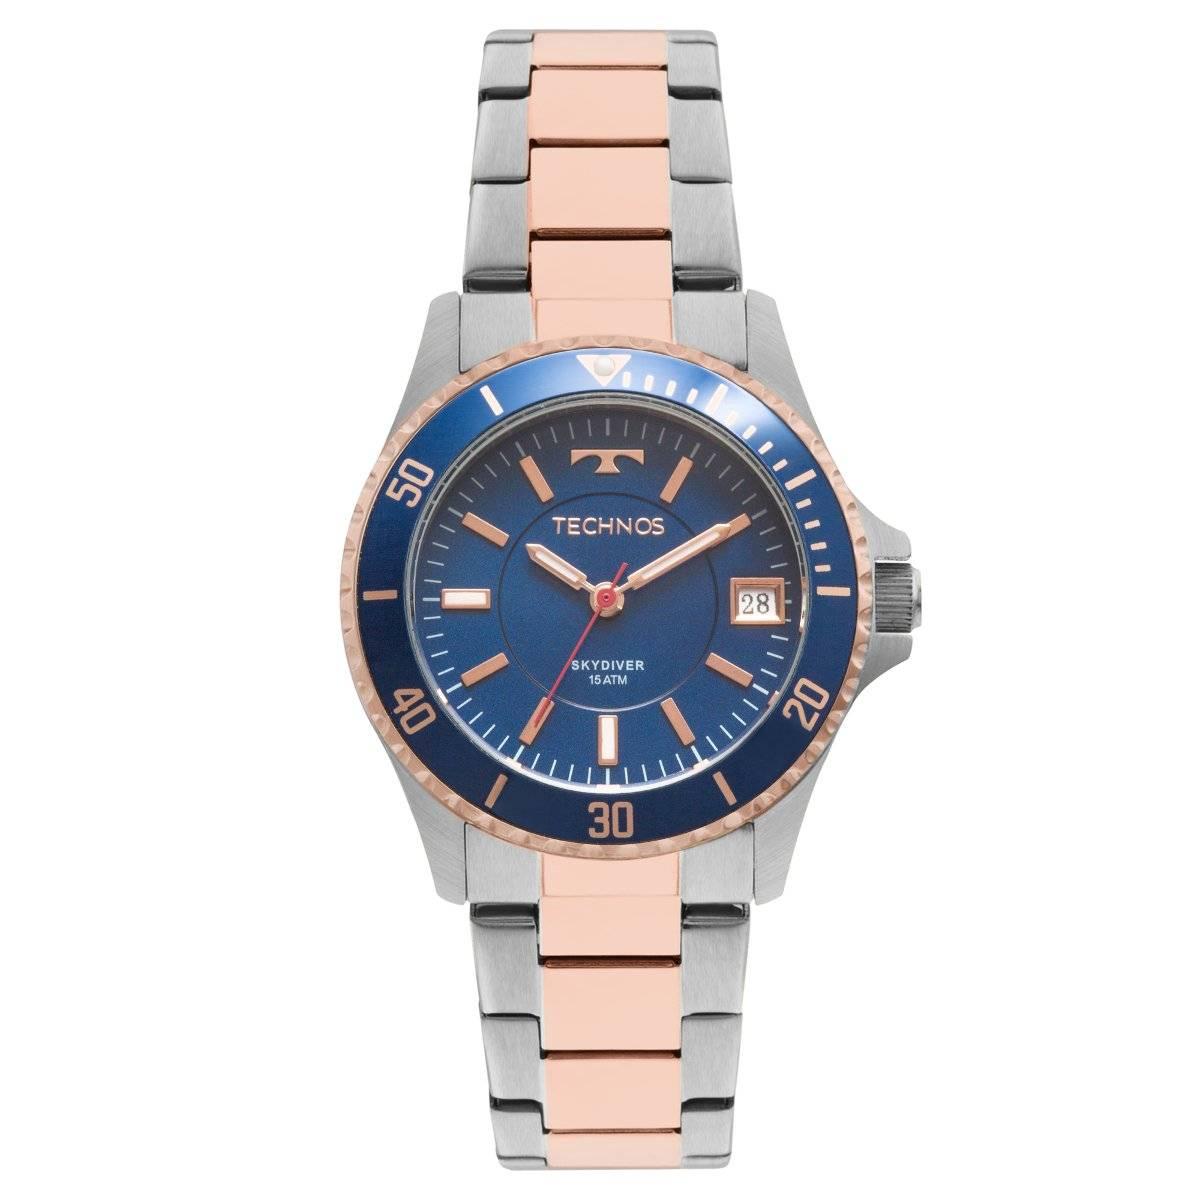 Relógio Technos Elegance Skydiver Feminino Quartz 2115MMM/5A